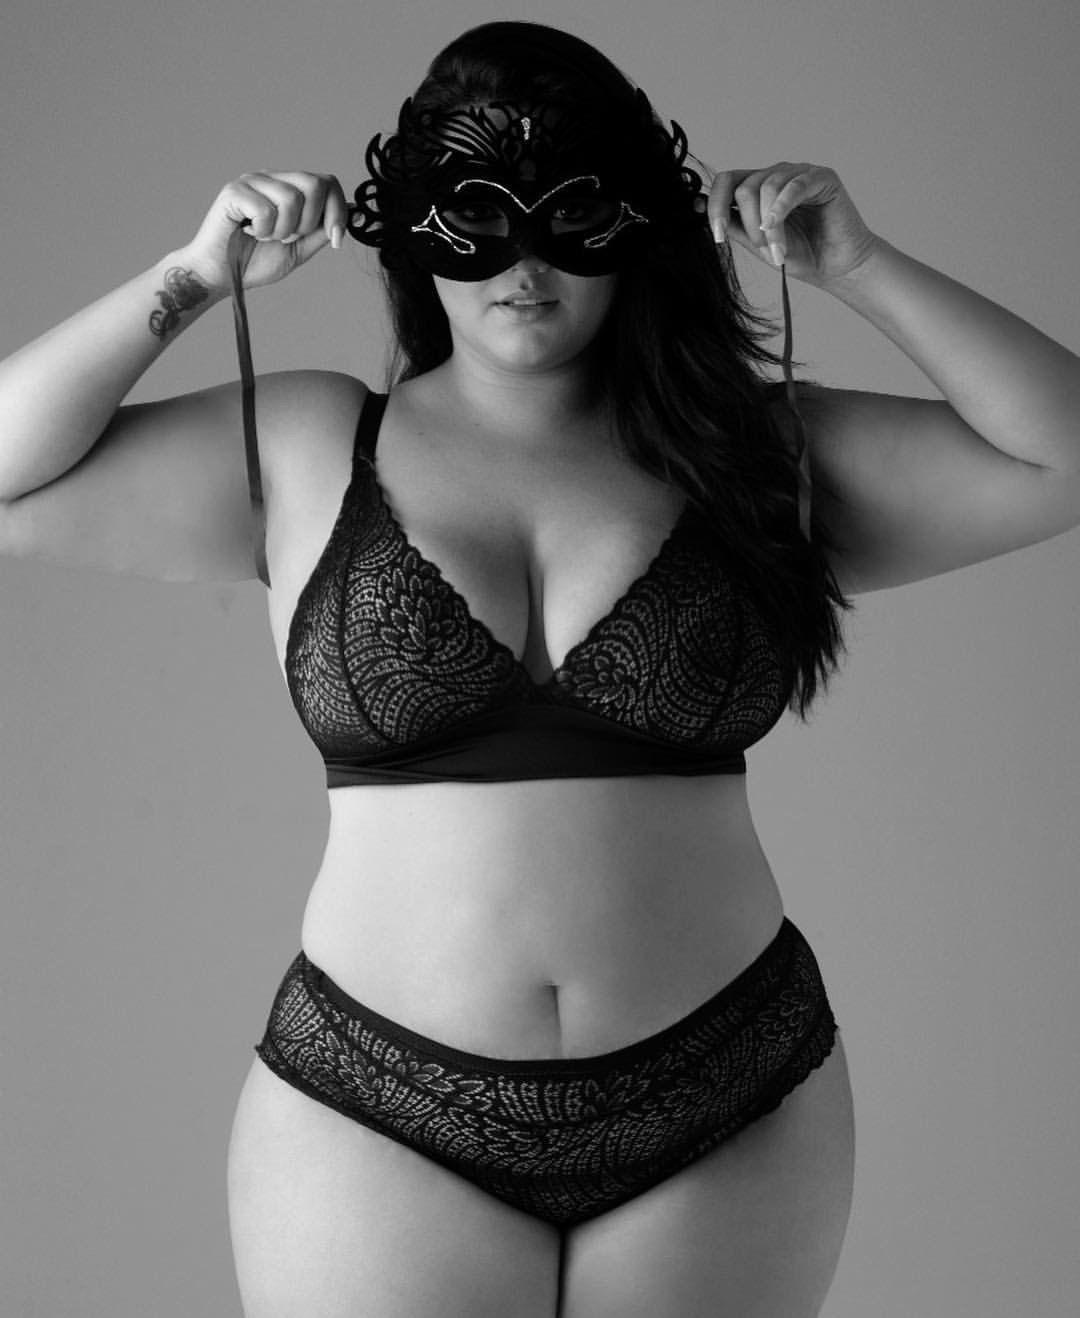 Confident chubby girls